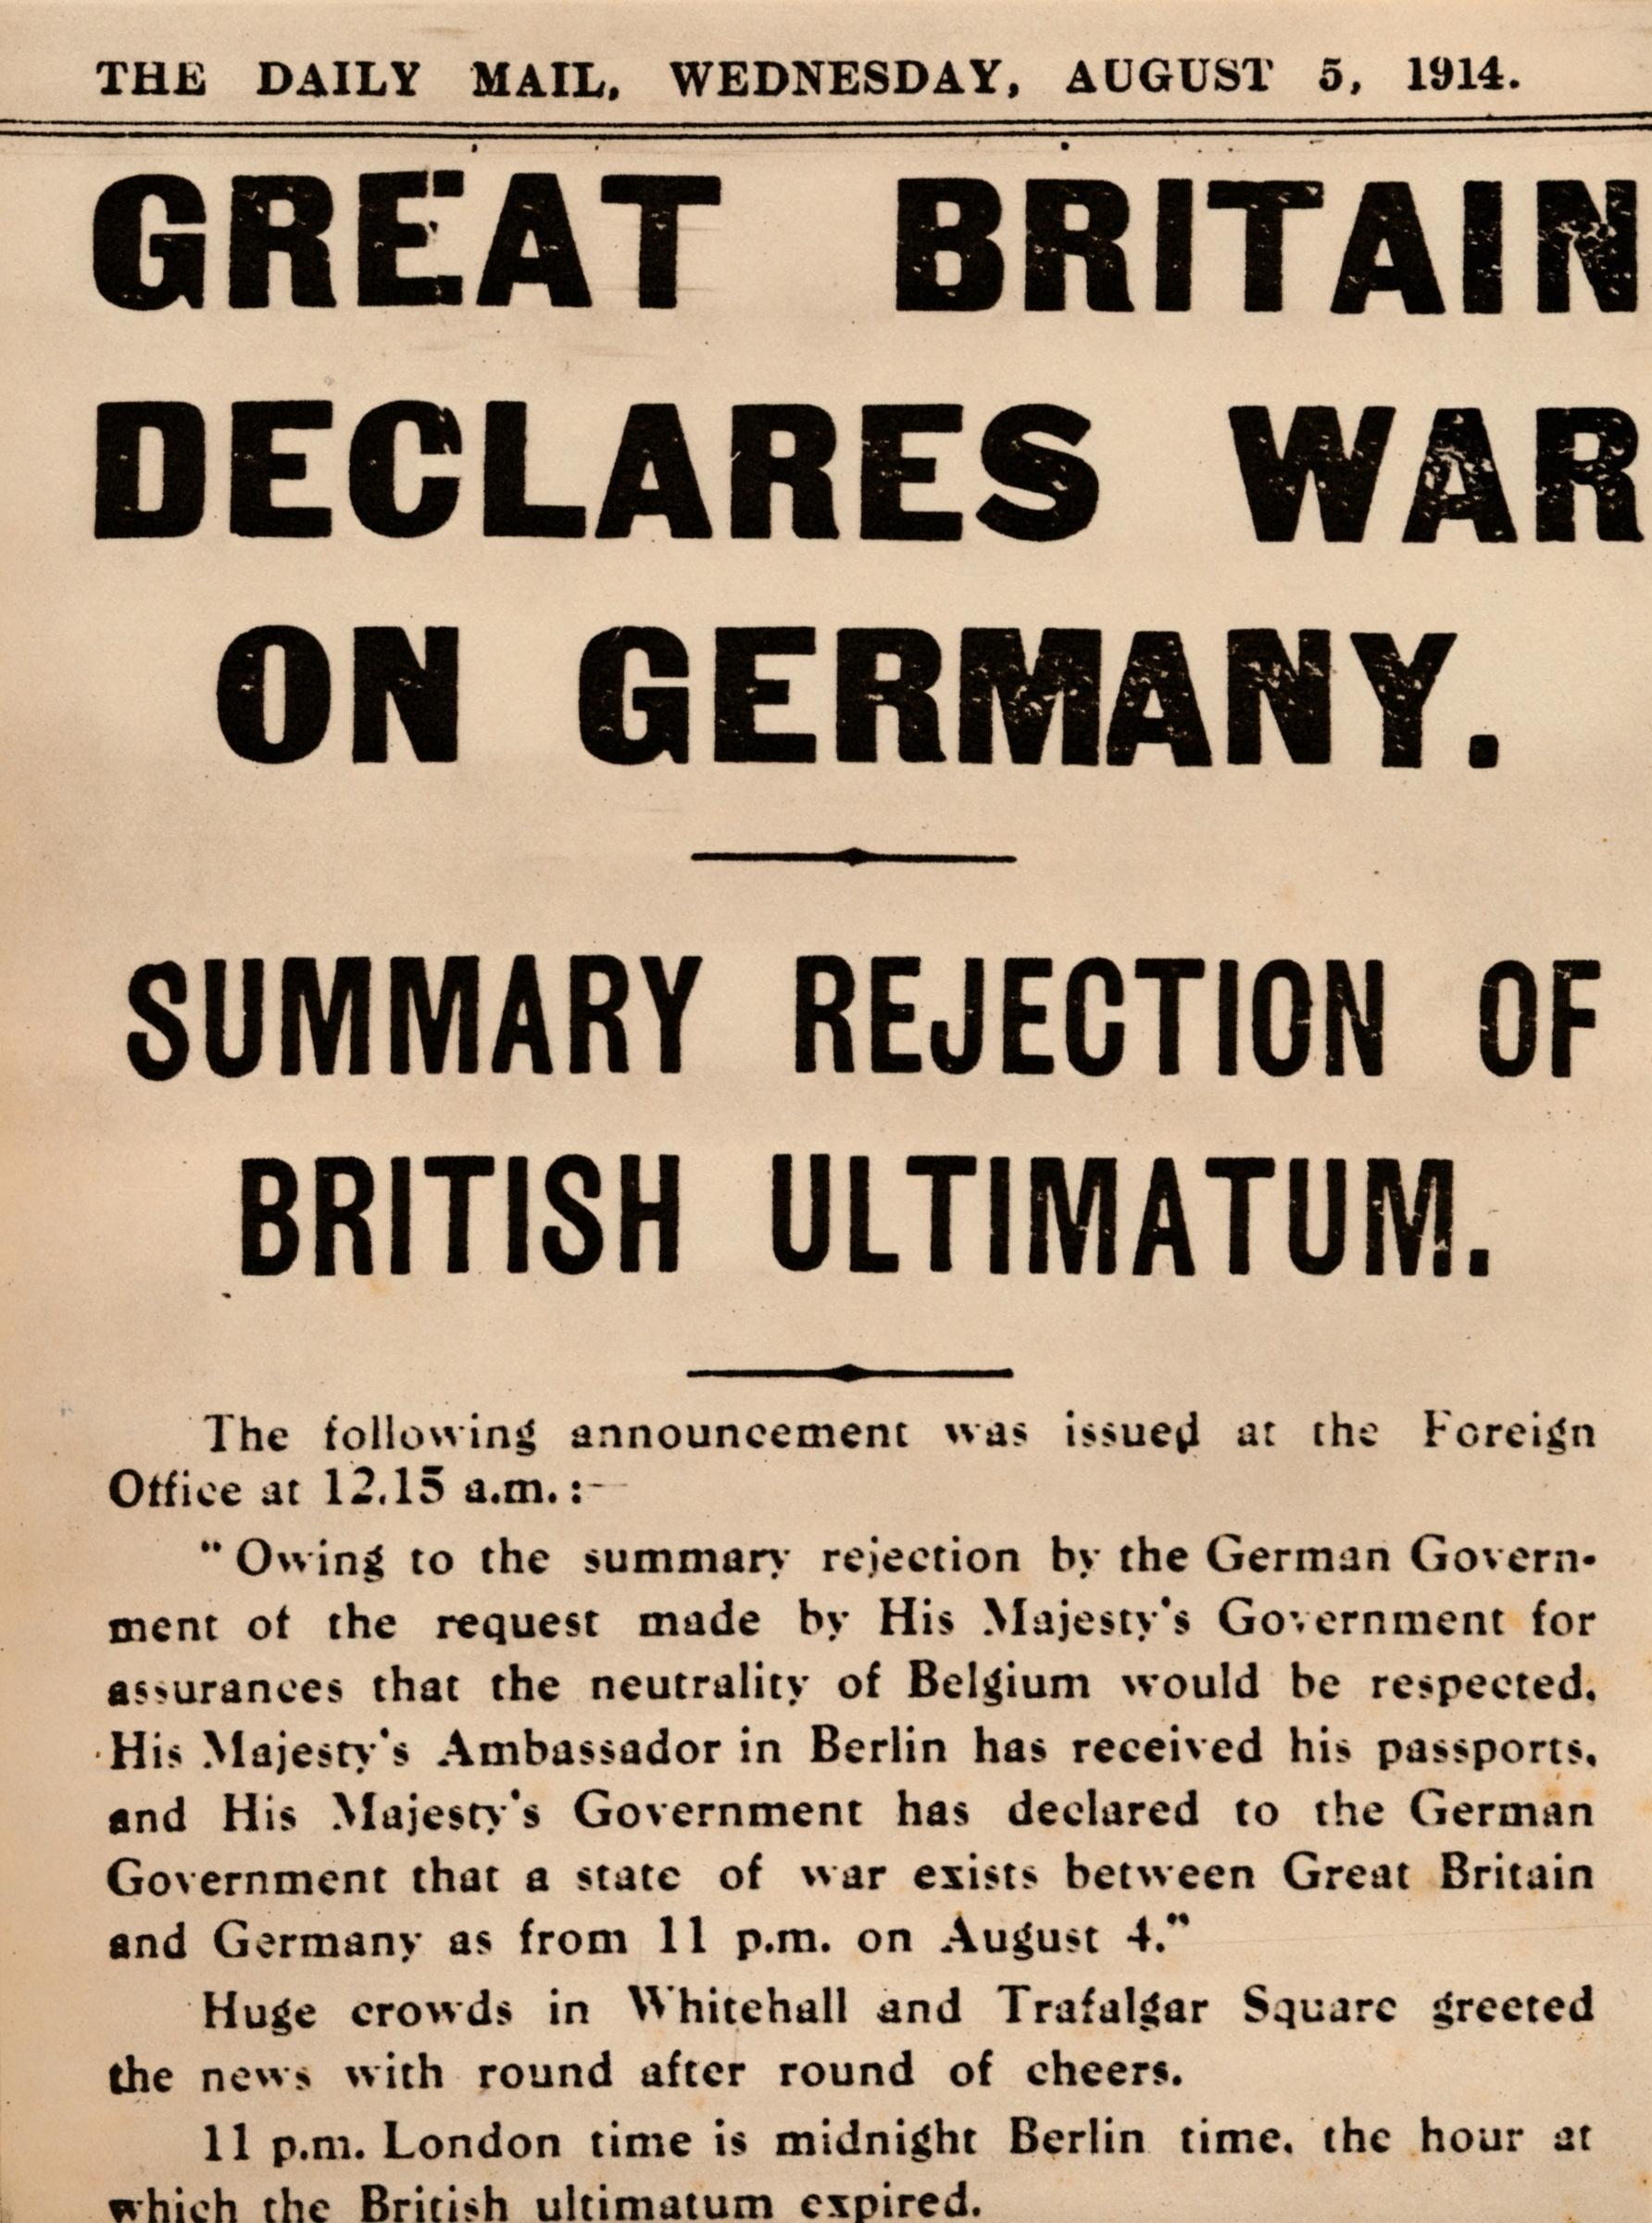 Britain20declares20war20on20Germany2C2019142C20newspaper-4816f00